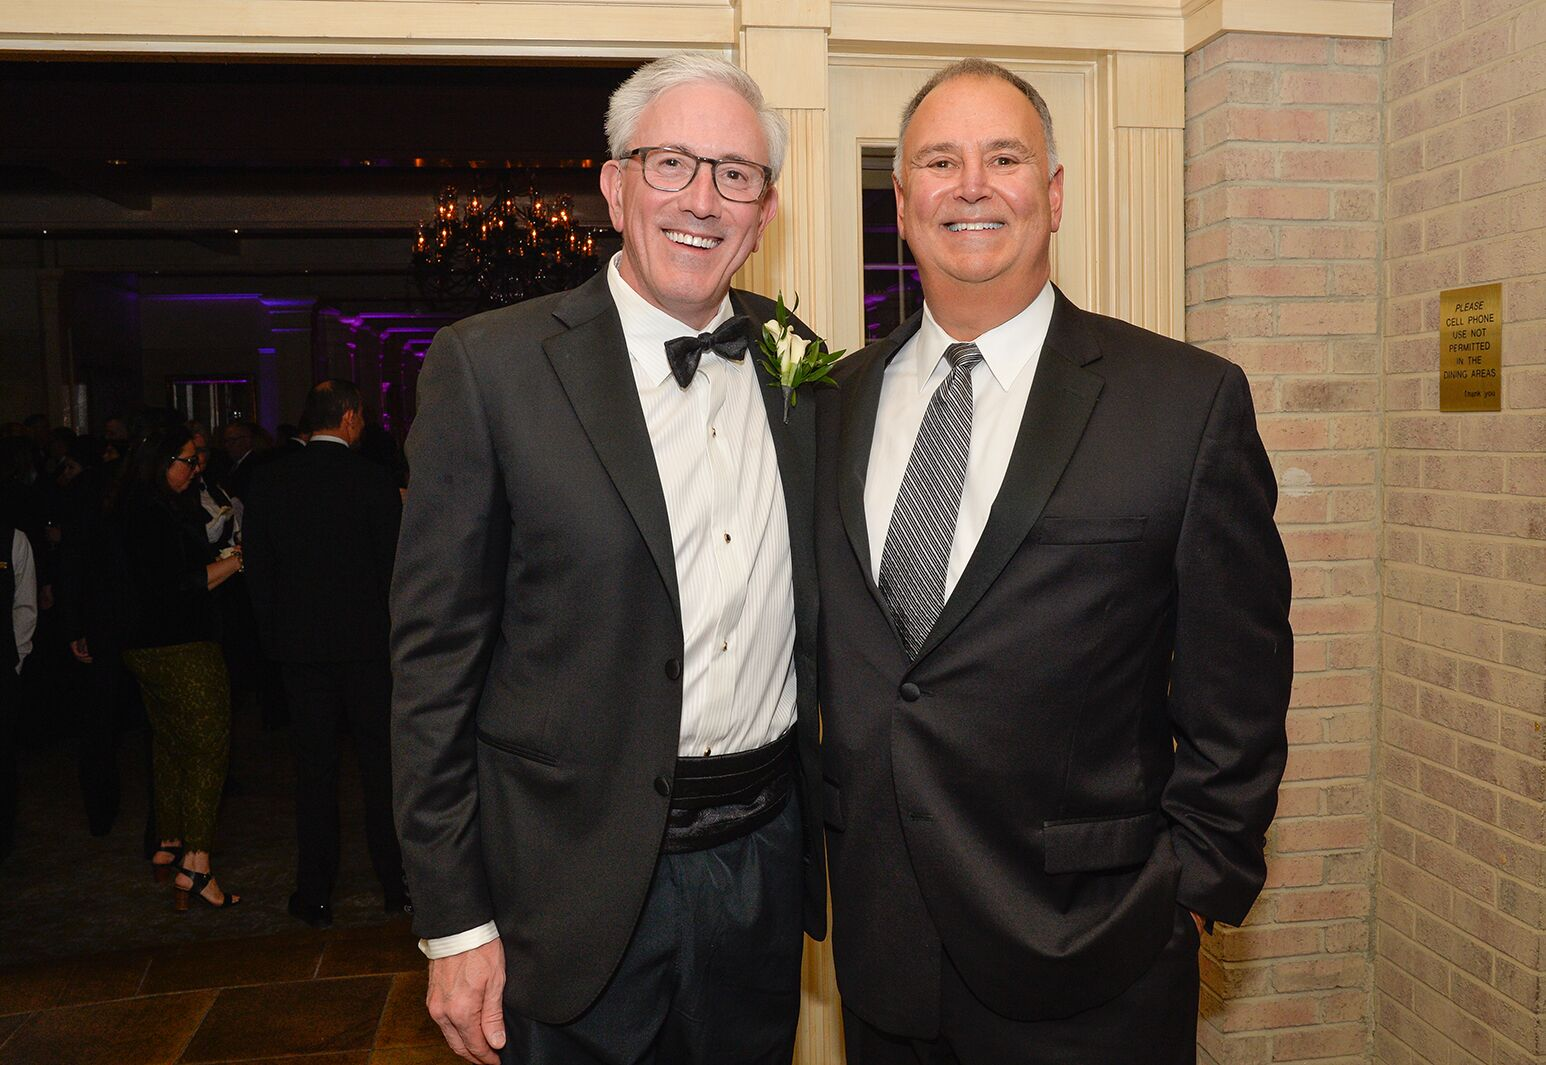 Dr. James Romanelli and Huntington Hospital Board Chairman Keith Friedlander at the 2018 Huntington Hospital Gala.